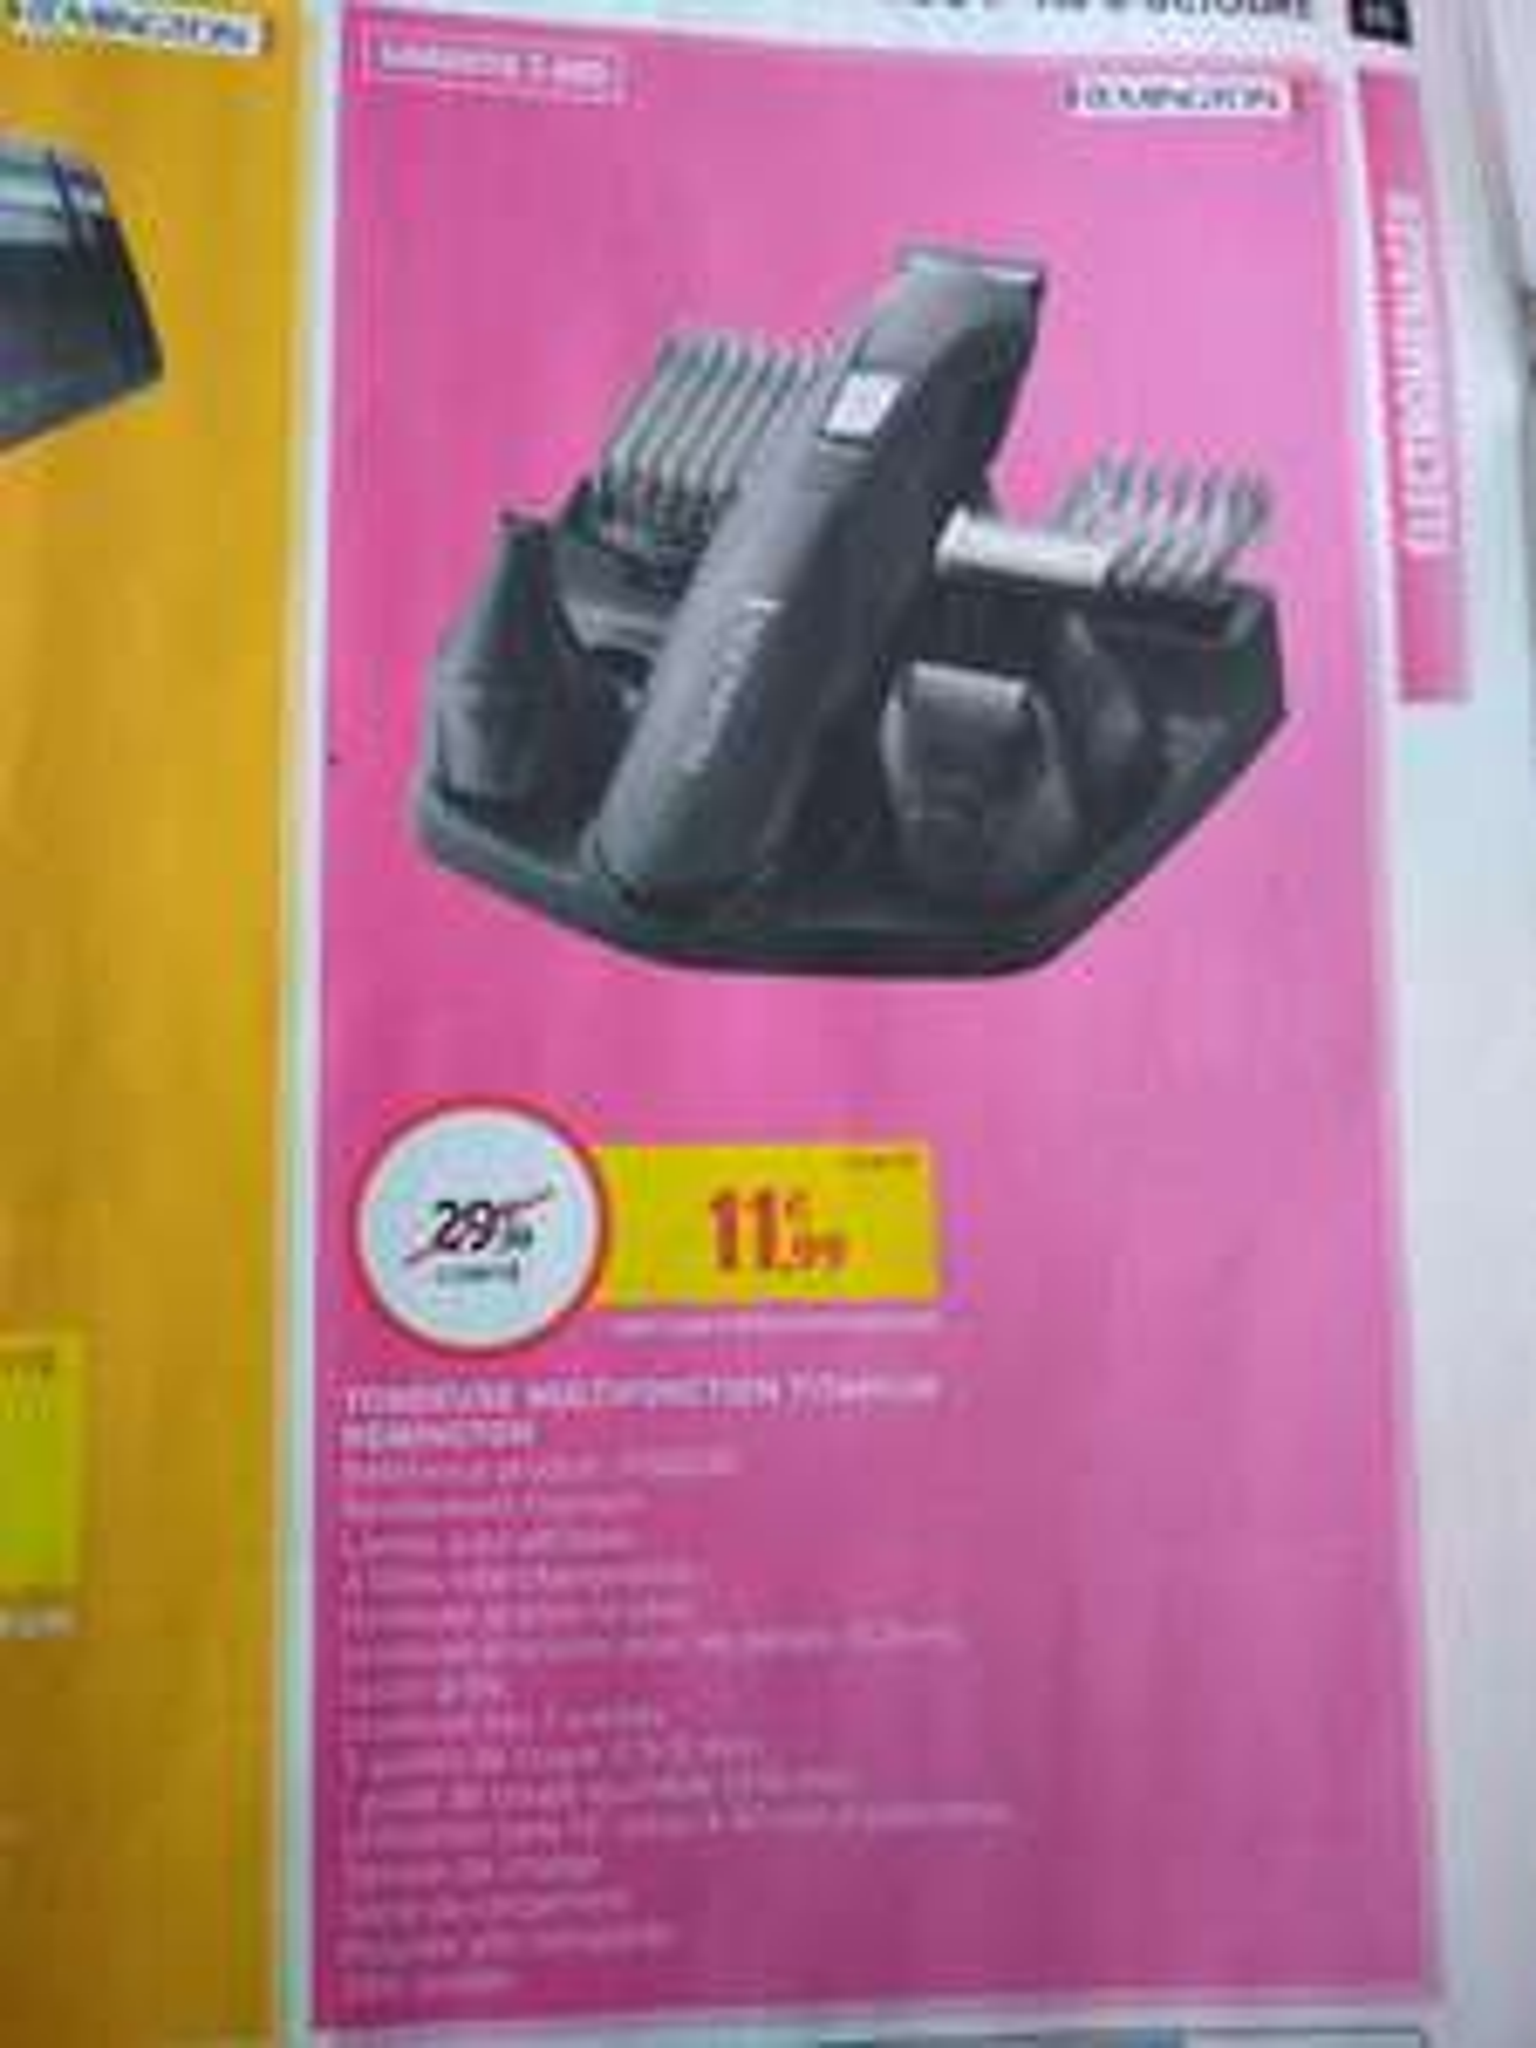 Tondeuse multifonction Titanium Remington PG6030